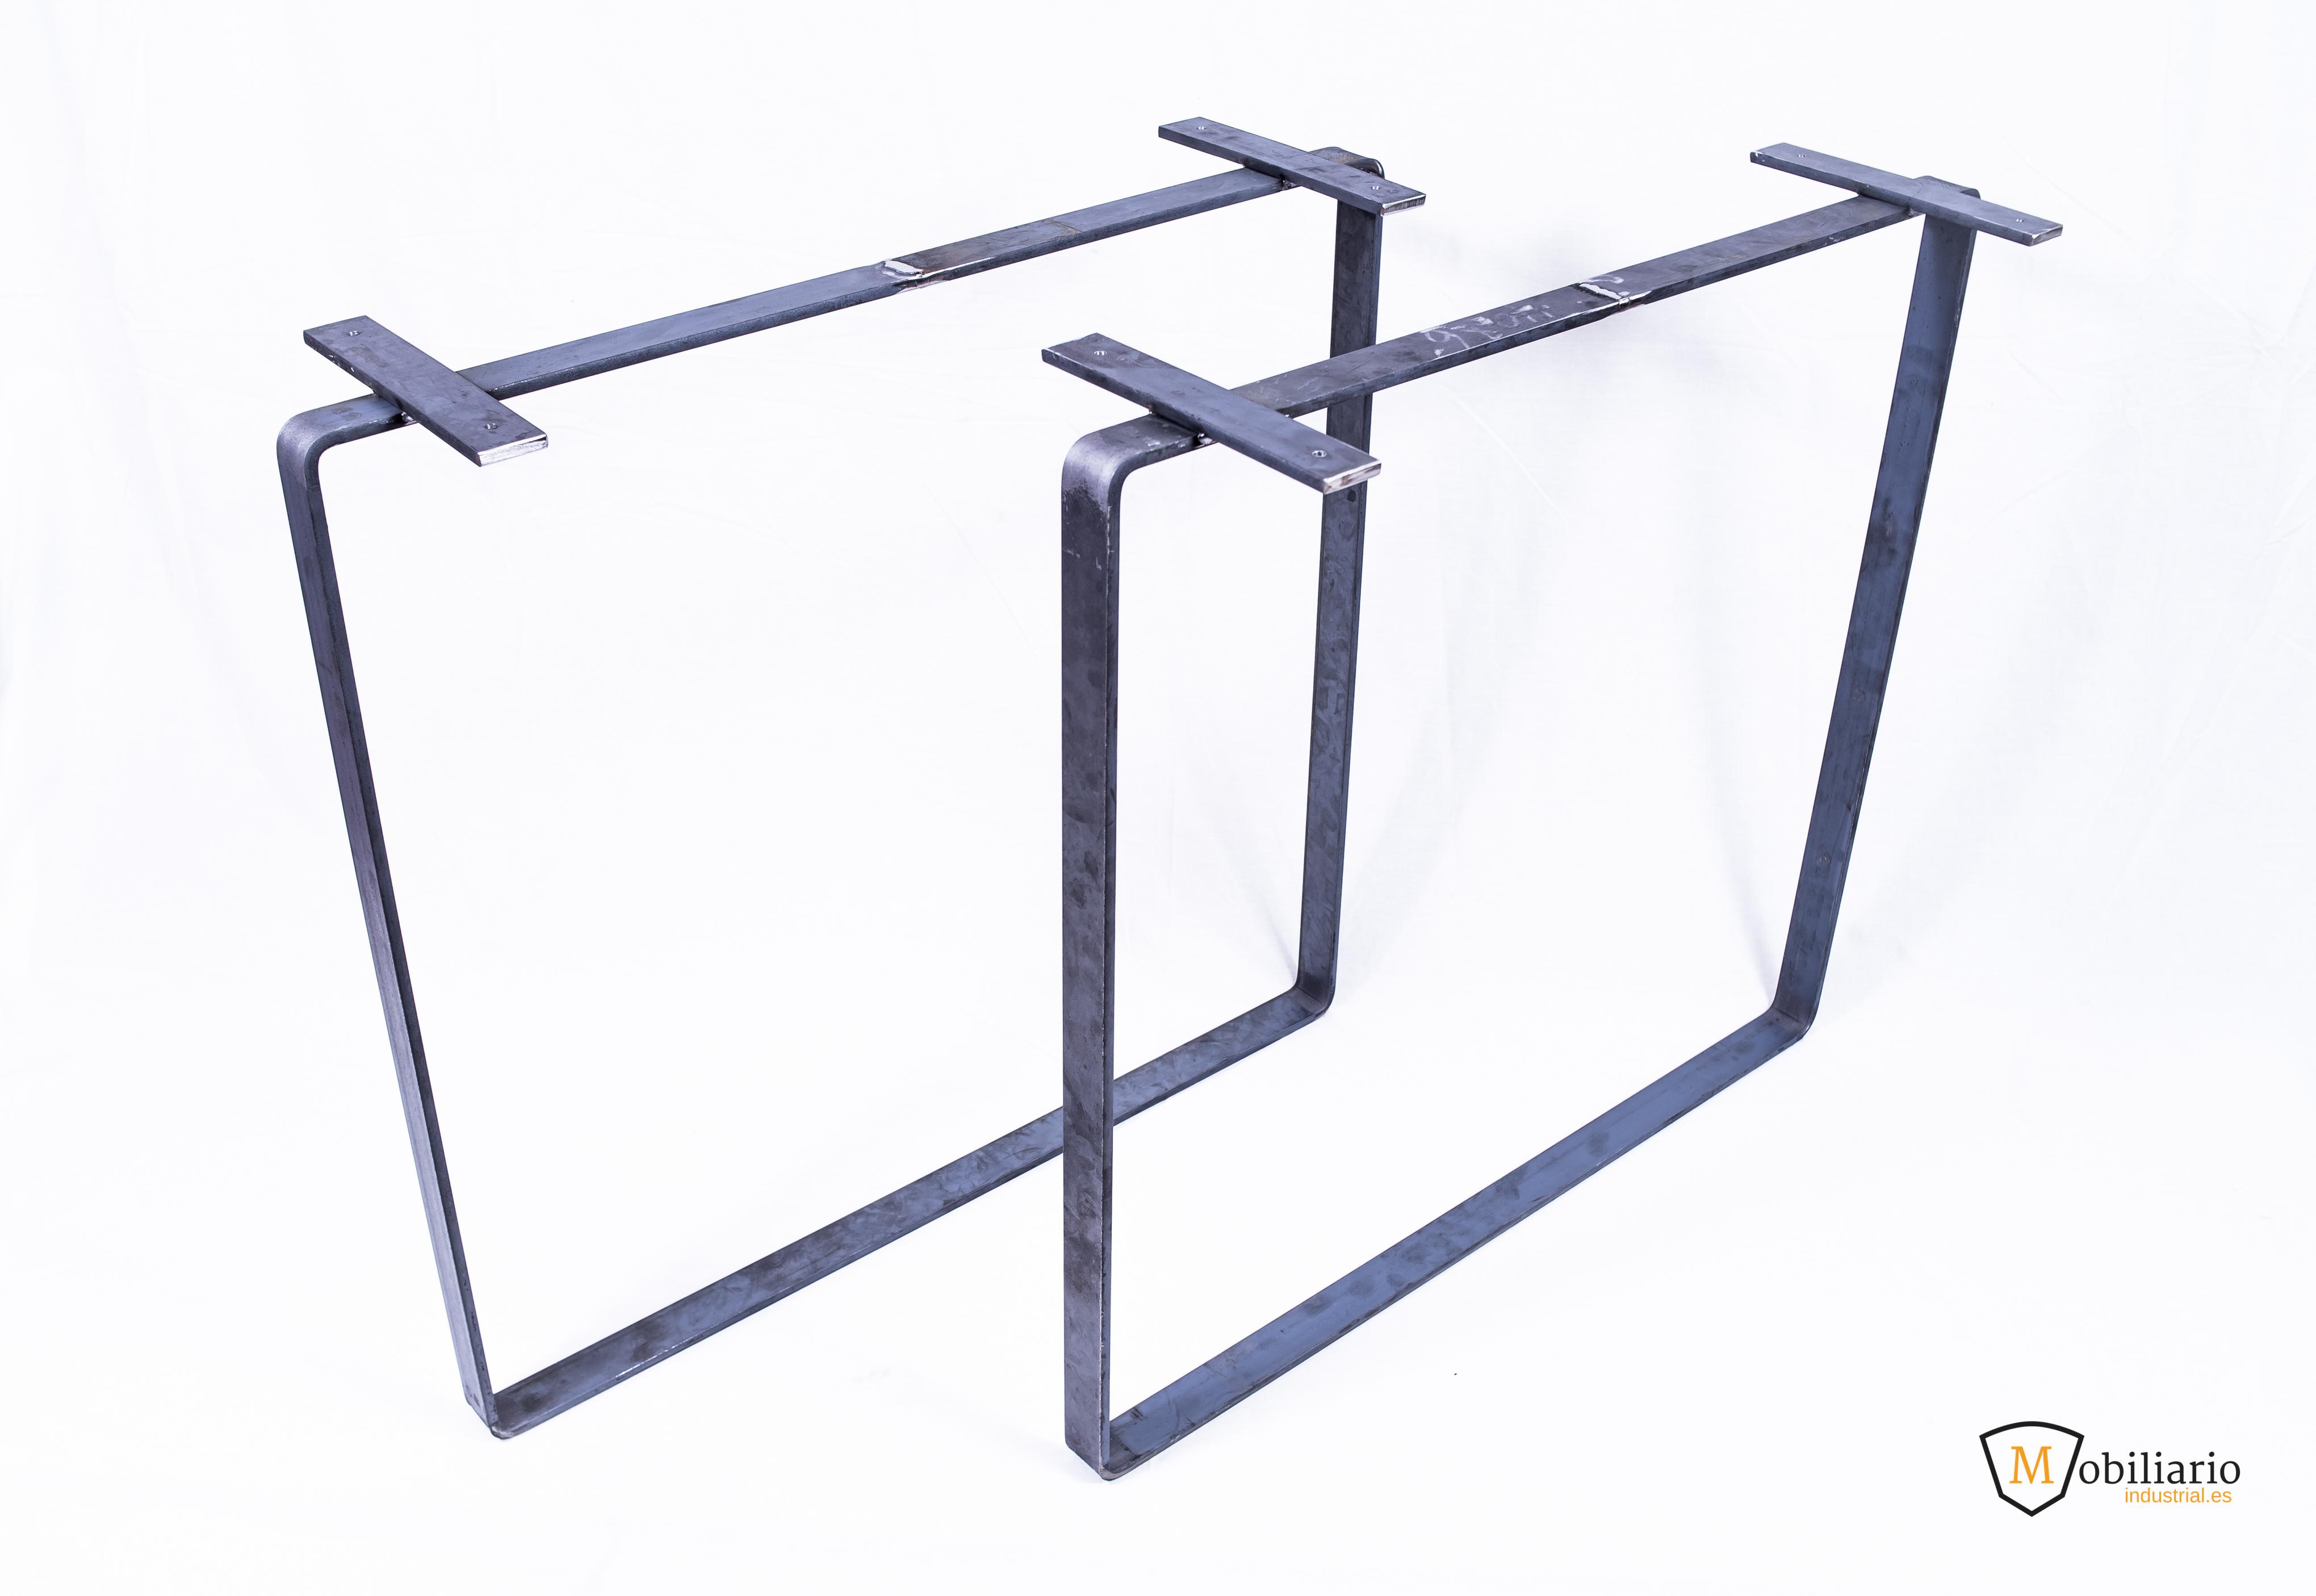 fabricar una mesa con pata de pletina acero macizo